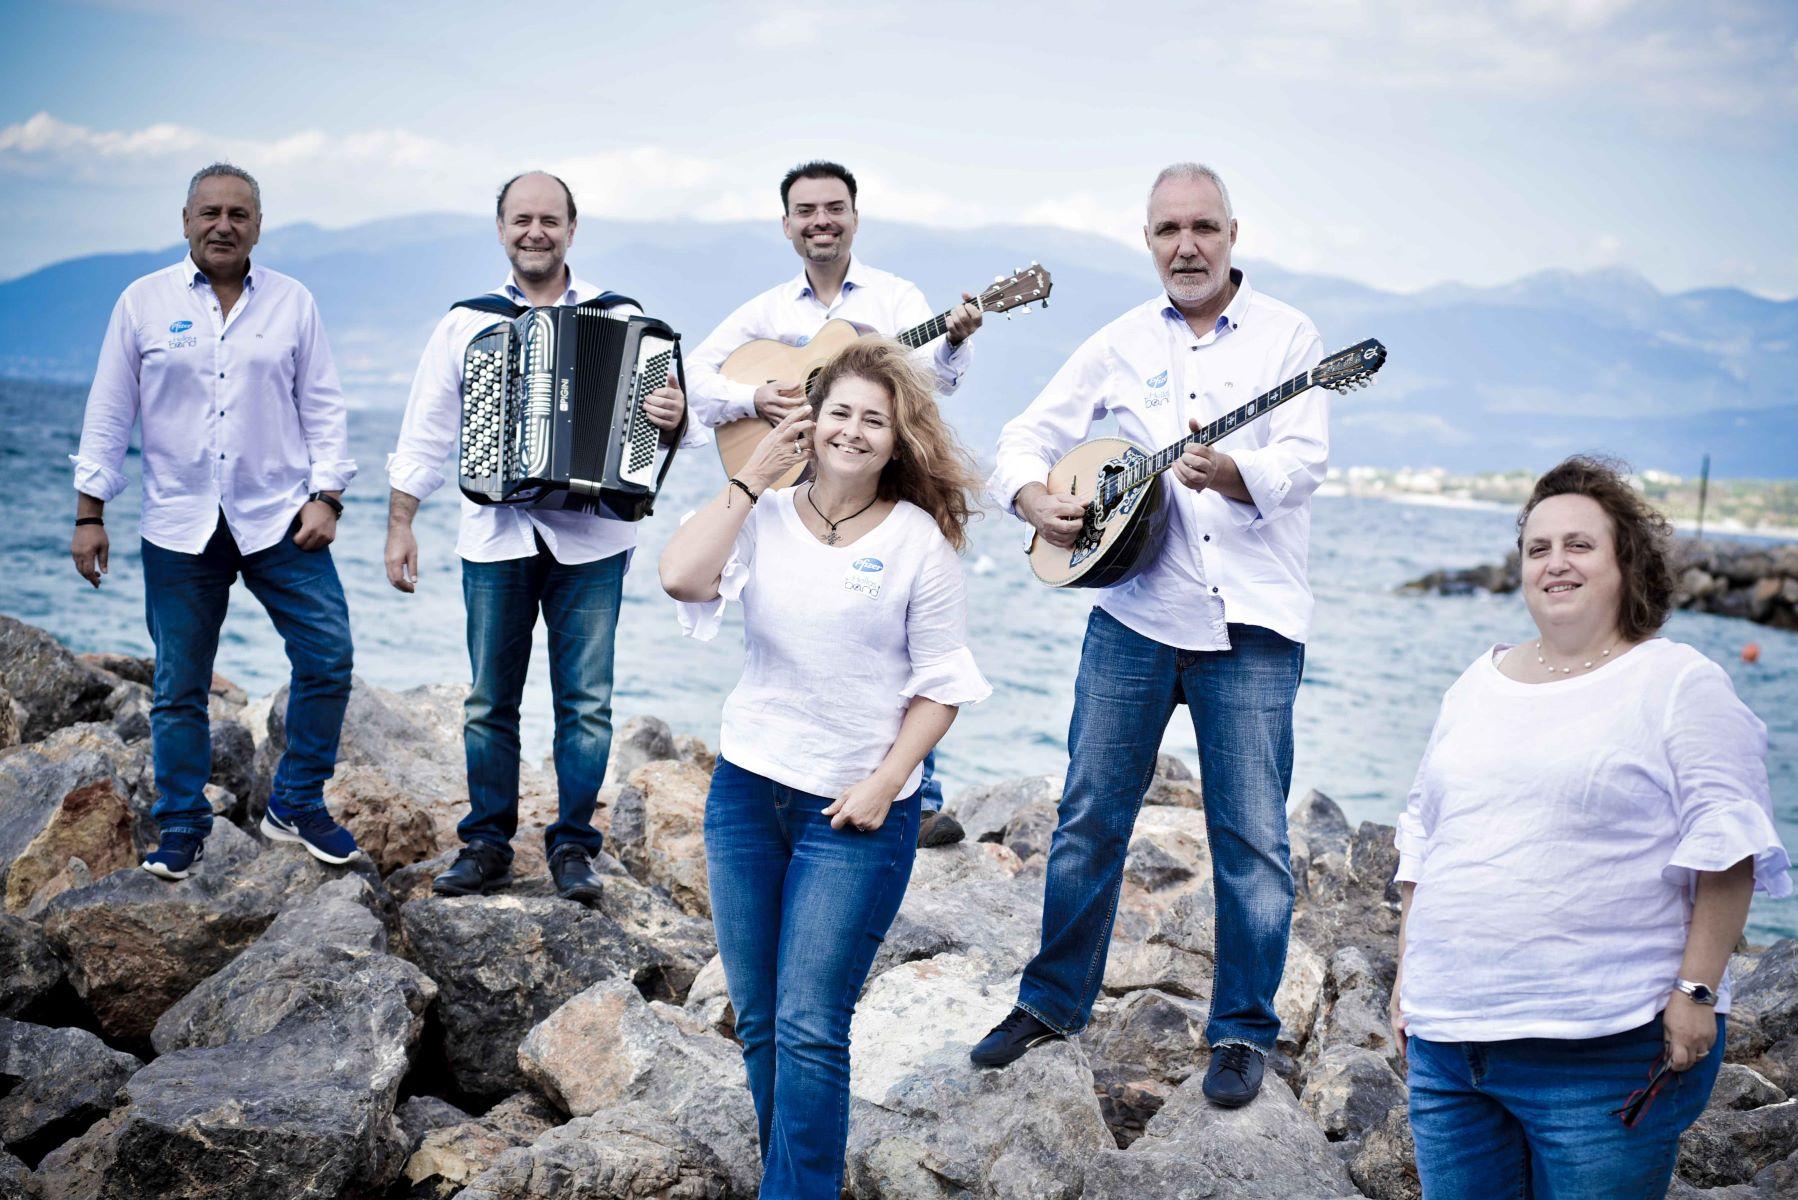 Pfizer Hellas Band: Τιμήθηκε με το Βραβείο Νικολάου Καρόλου